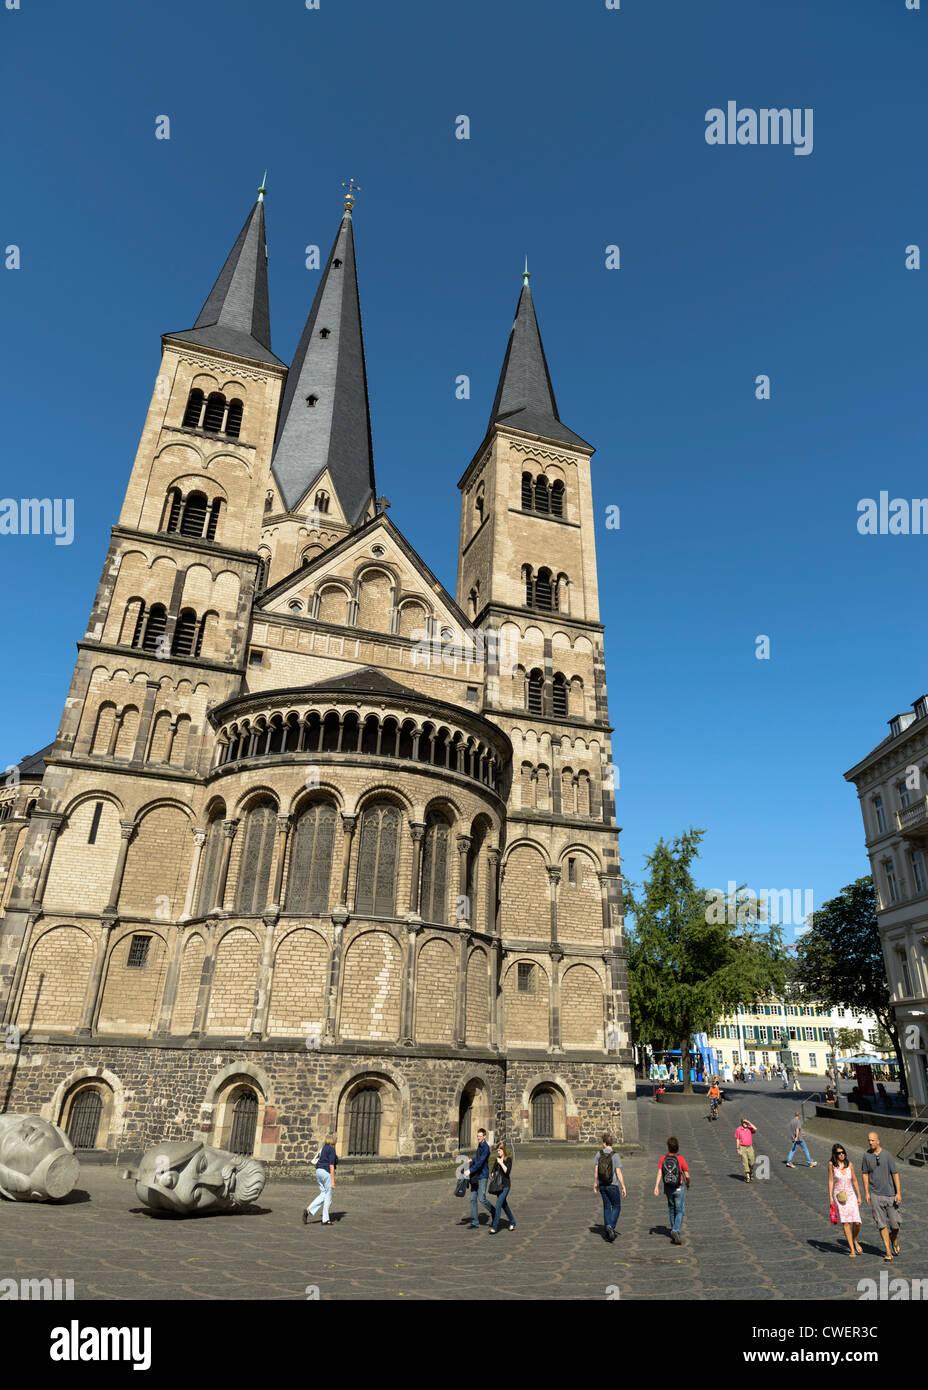 Bonn Cathedral,Bonn,Germany,Europe - Stock Image